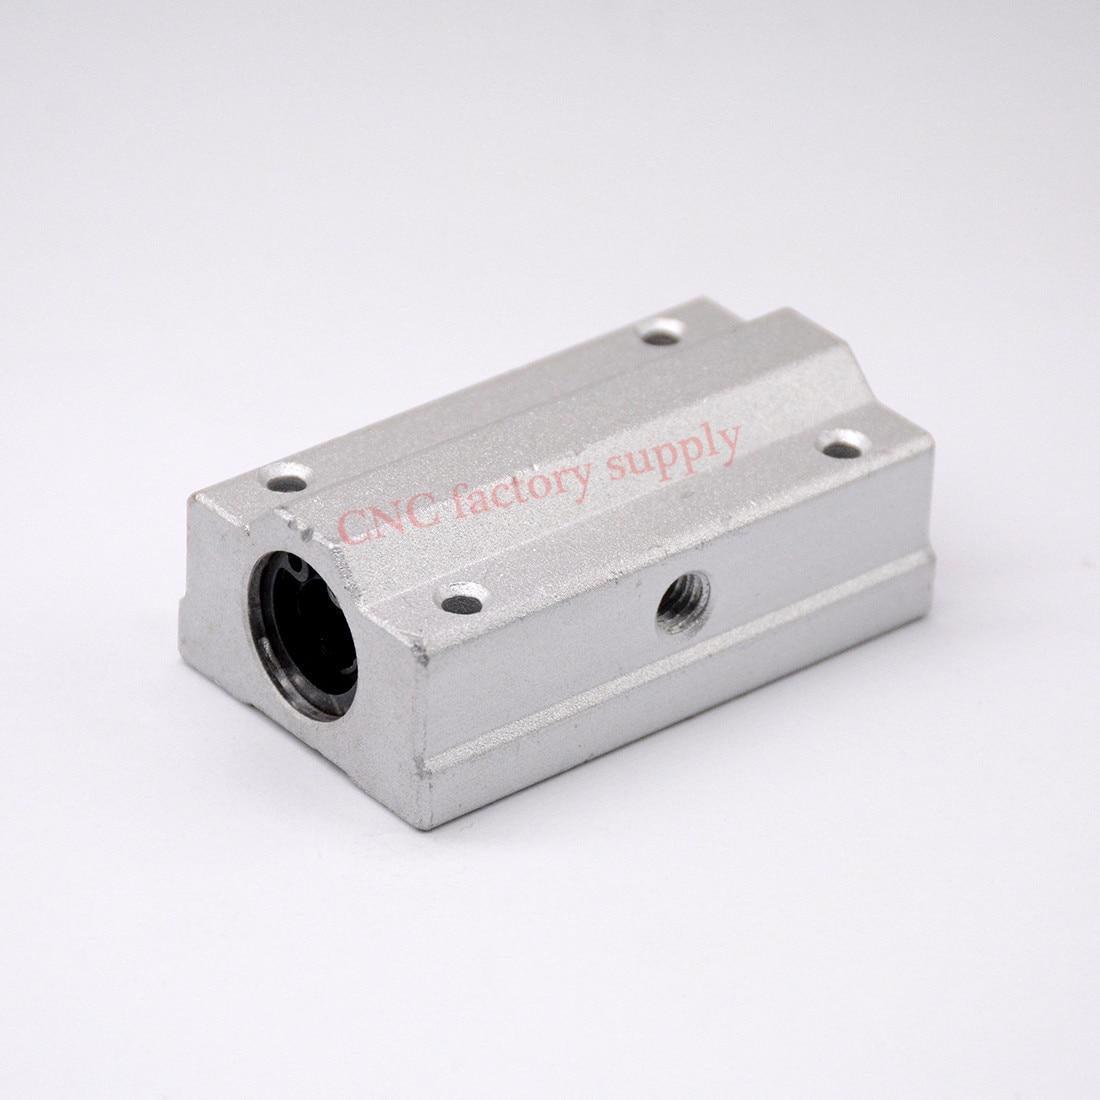 все цены на  Free shipping SC30LUU SCS30LUU 30mm long type Linear Ball Bearing Block CNC Router  онлайн